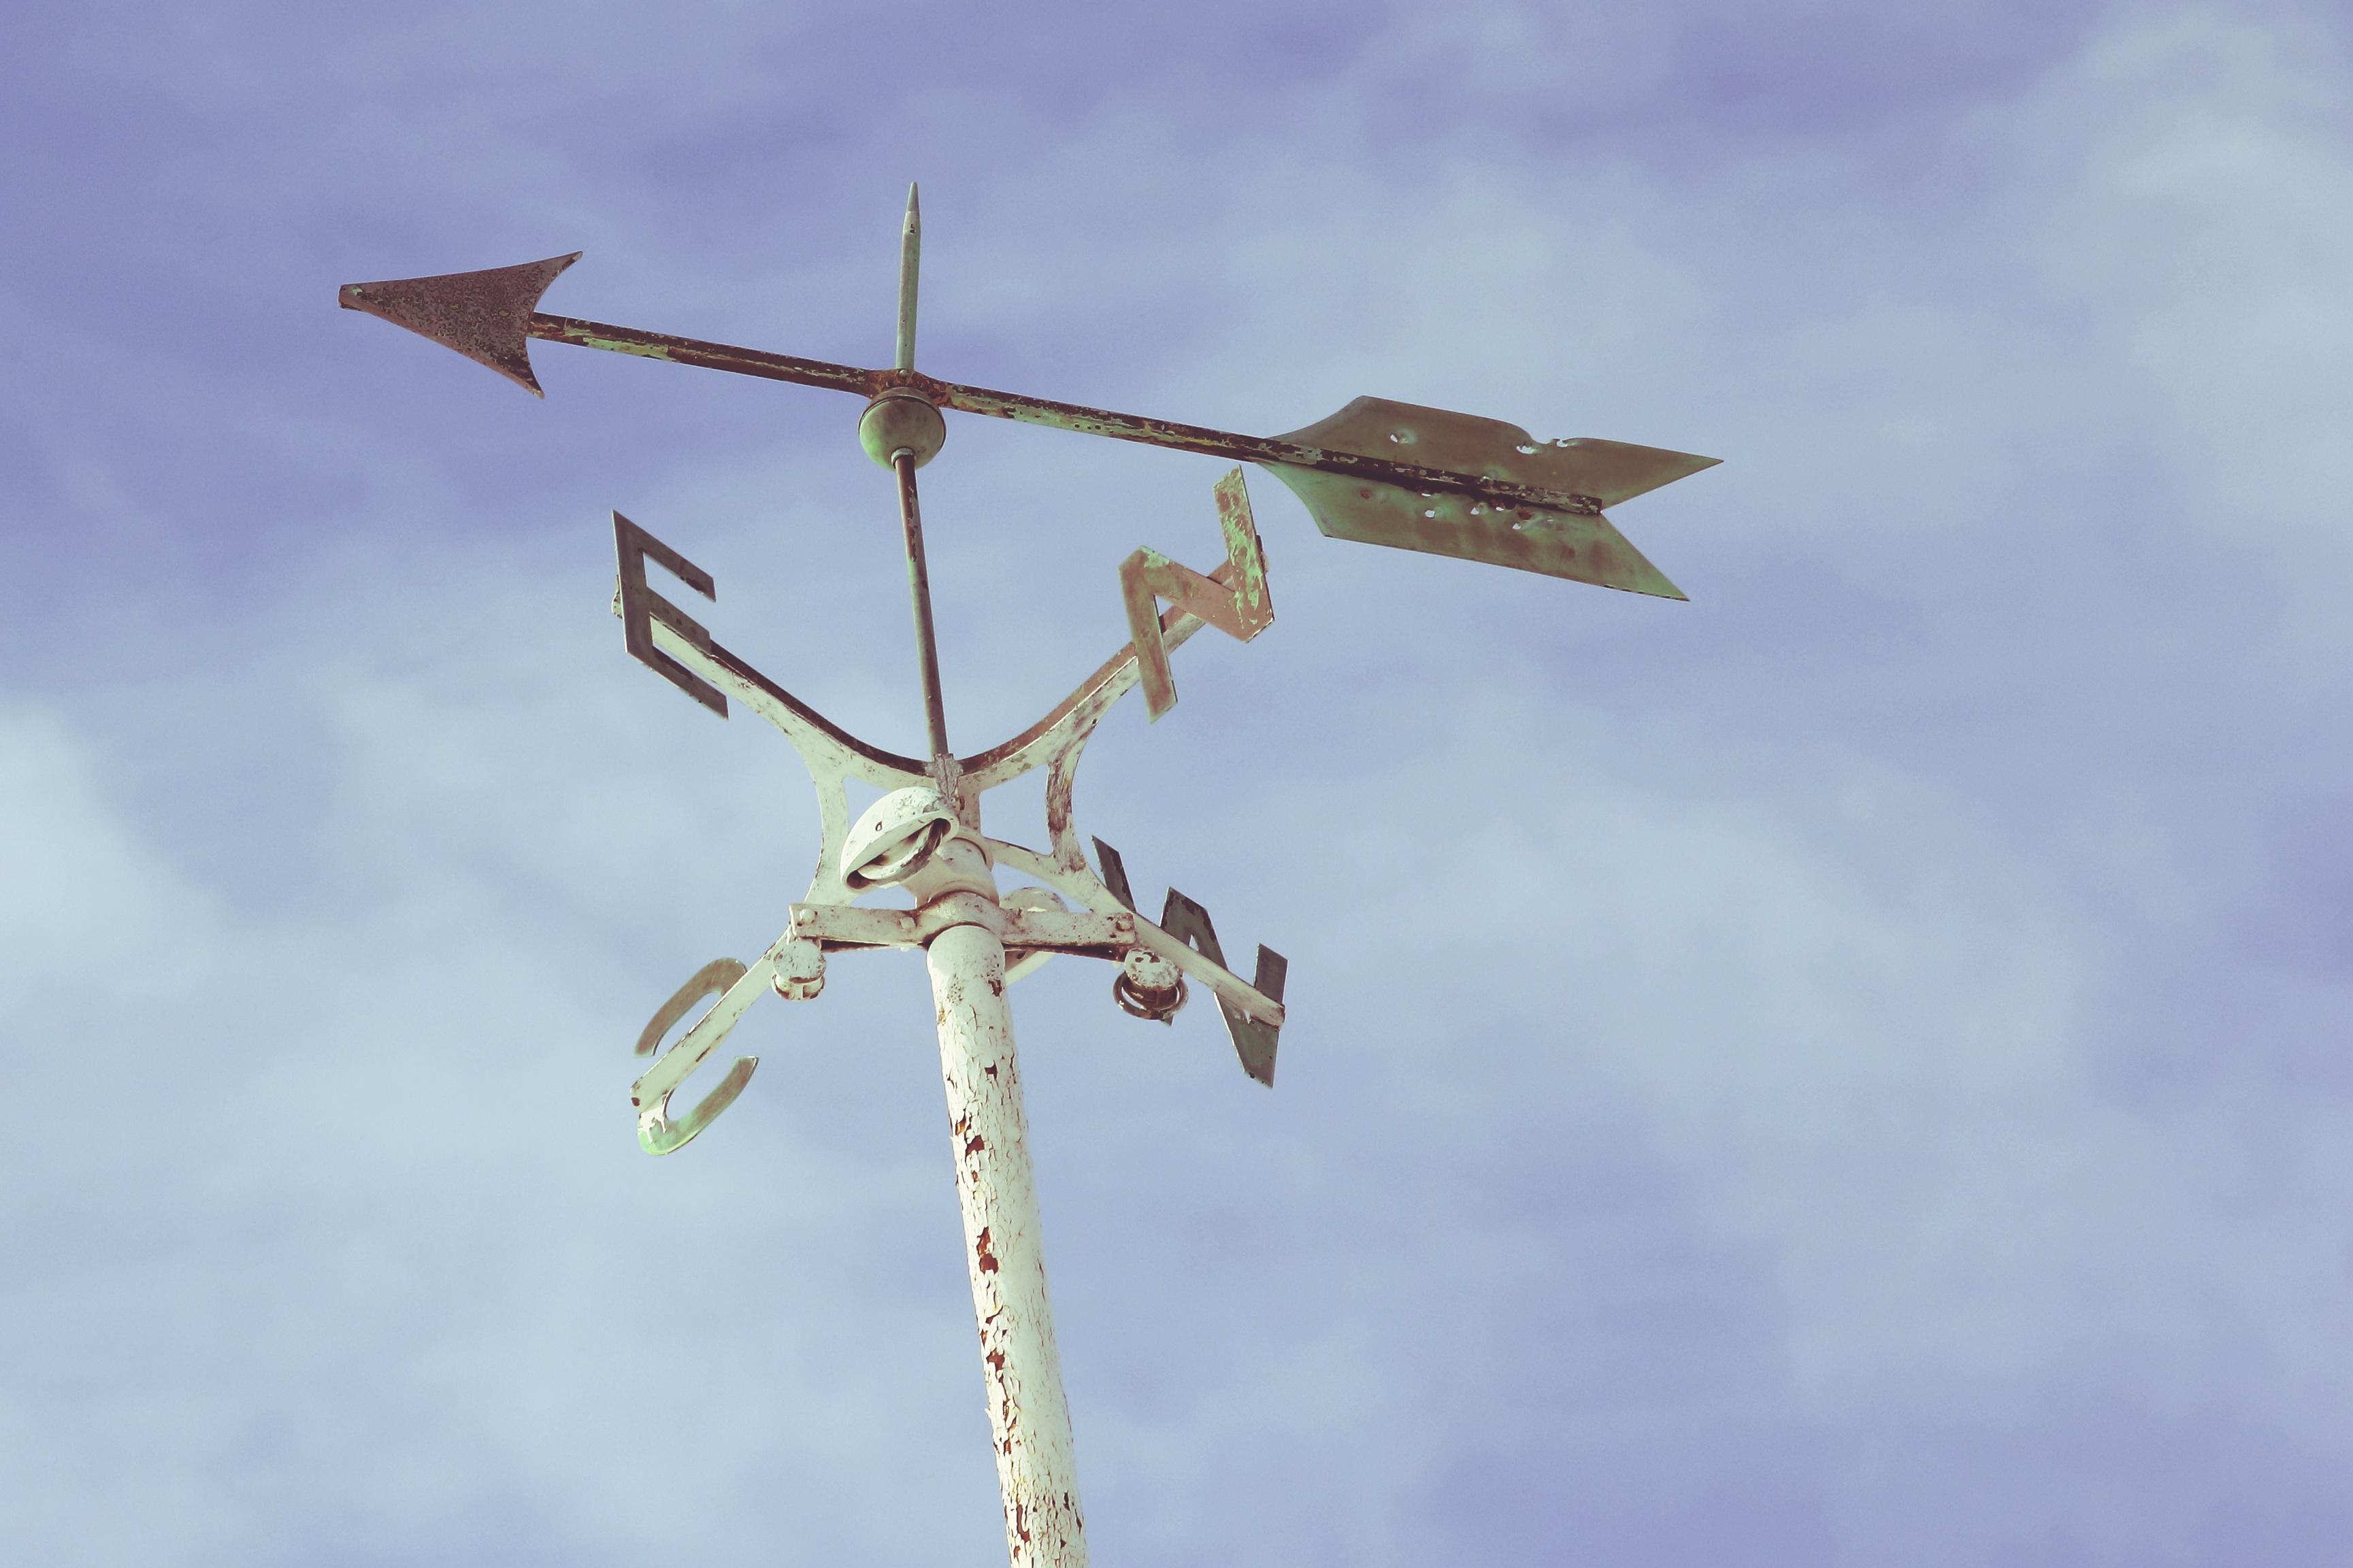 Free images wing wind airplane aircraft direction vehicle wing wind airplane aircraft direction vehicle symbol metal machine cross north weather vane crucifix atmosphere of buycottarizona Gallery